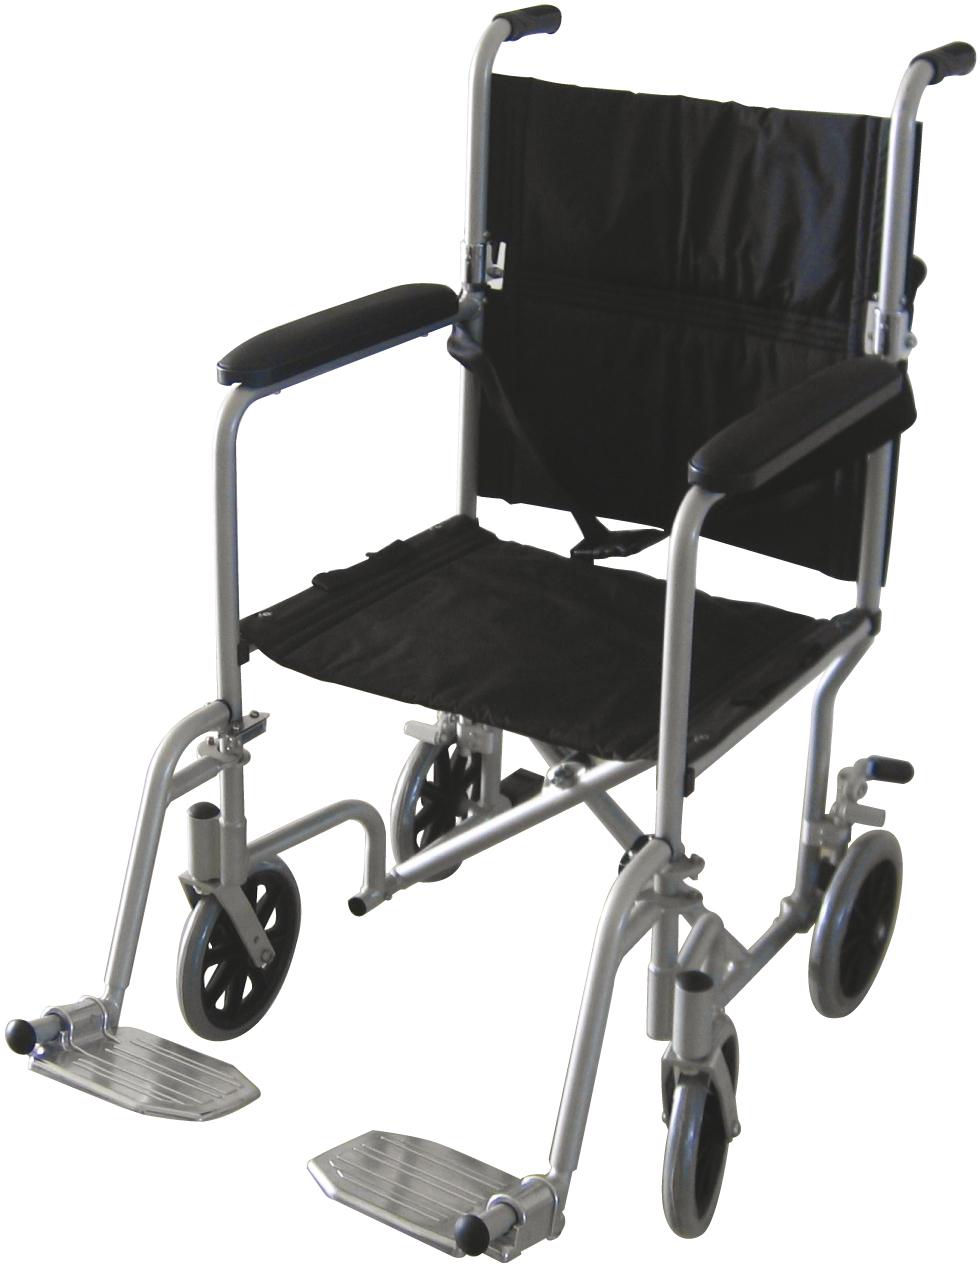 Silla de ruedas transporte ortopedia para ti - Ortopedia silla de ruedas ...